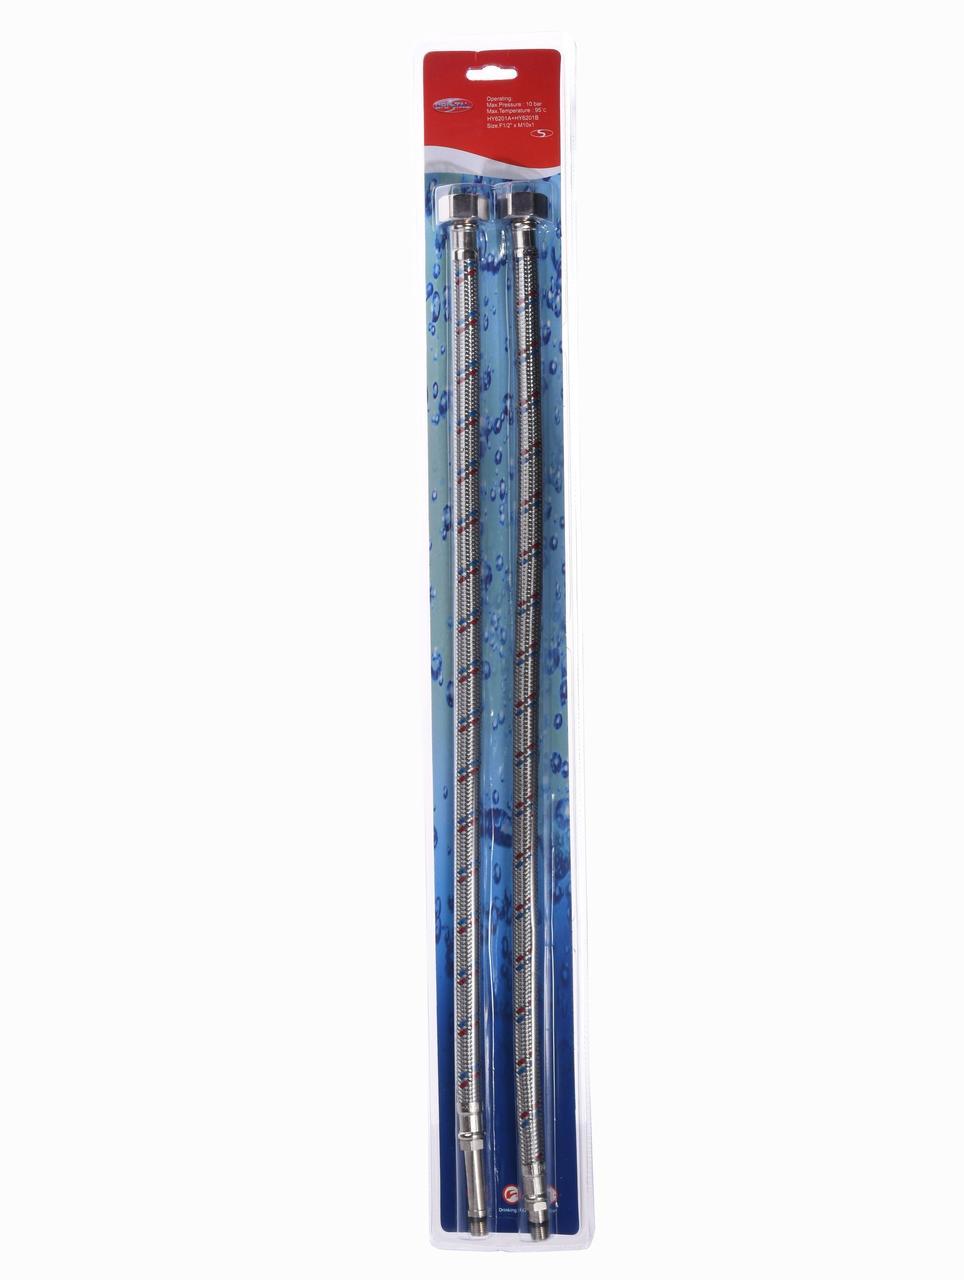 "Шланг для смесителя Solomon (нерж.) М10х1/2"" 0,4м (HY6201 A+B)  ПАРА в блистере"